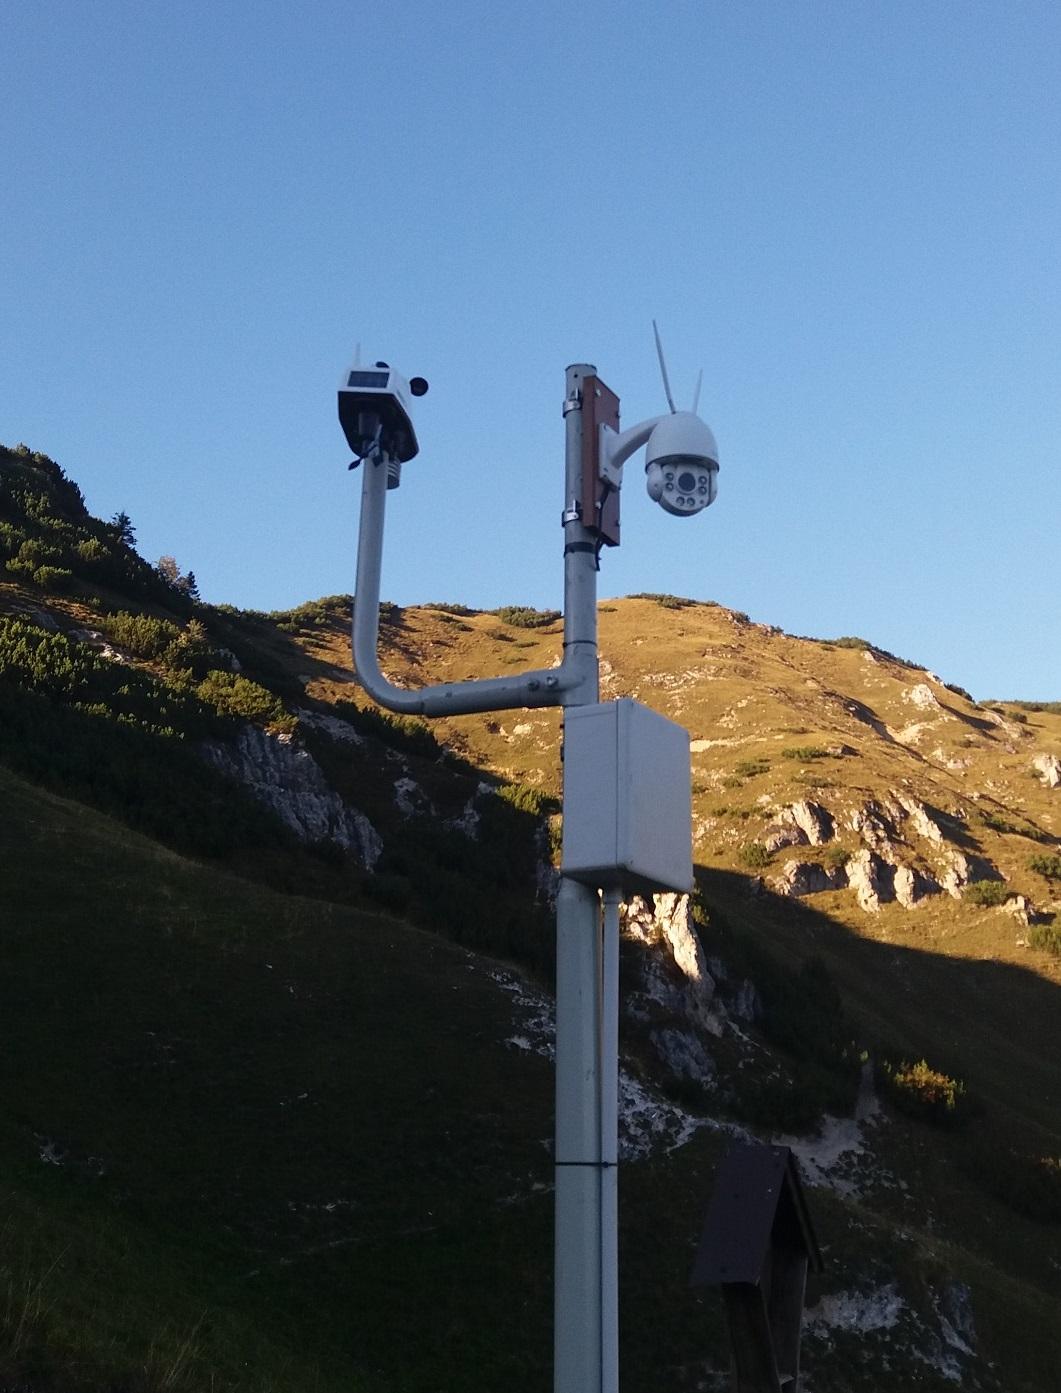 Stazione meteorologica di Malga Nardis - Davis Vantage Vue